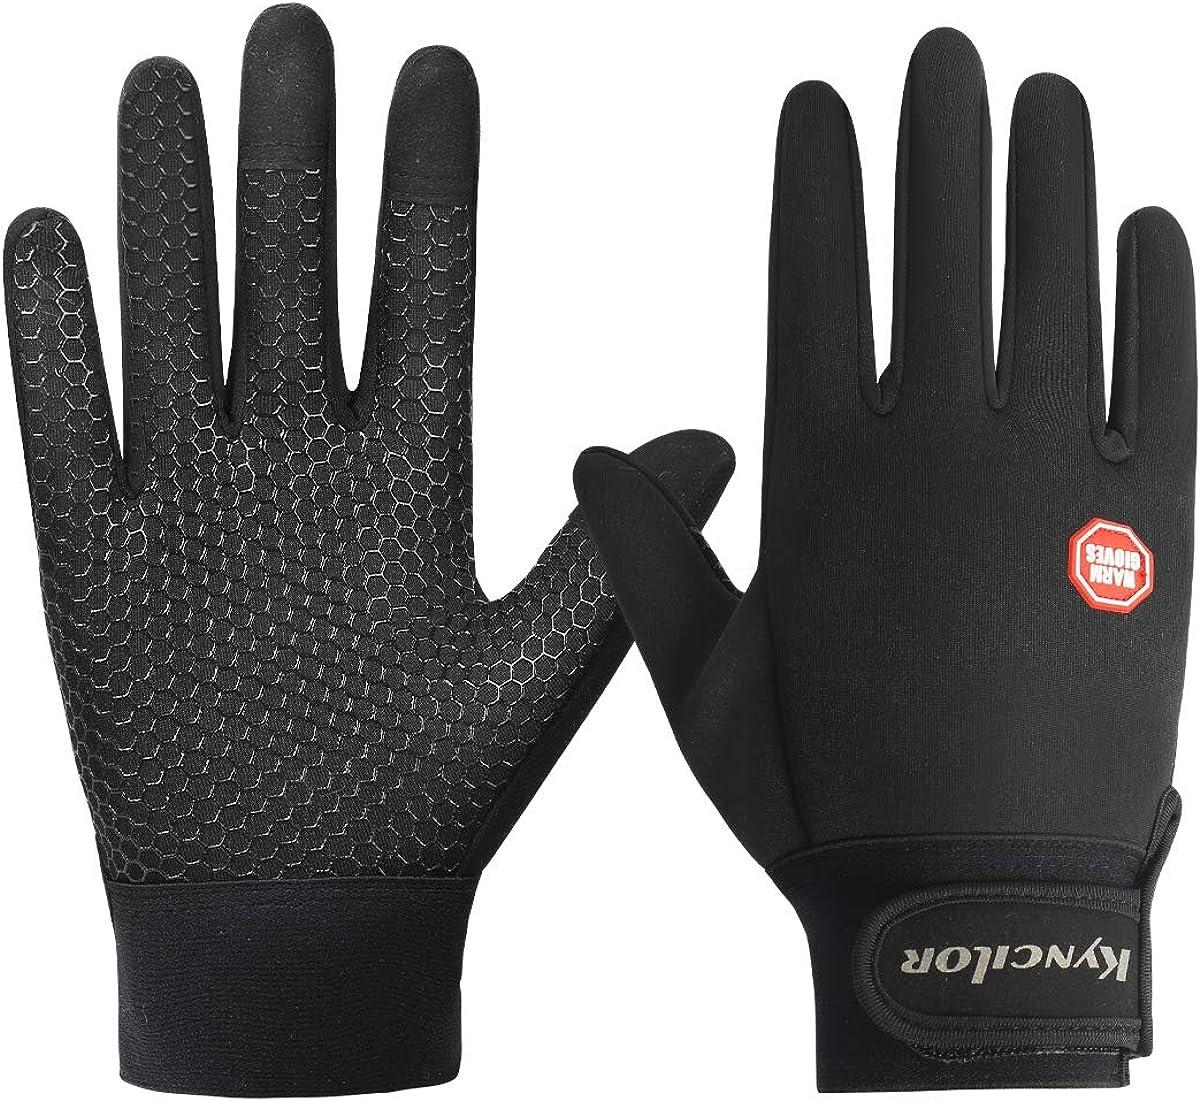 Mens Winter Warm Windproof Waterproof Fleece Lined Thermal Touch Screen Gloves